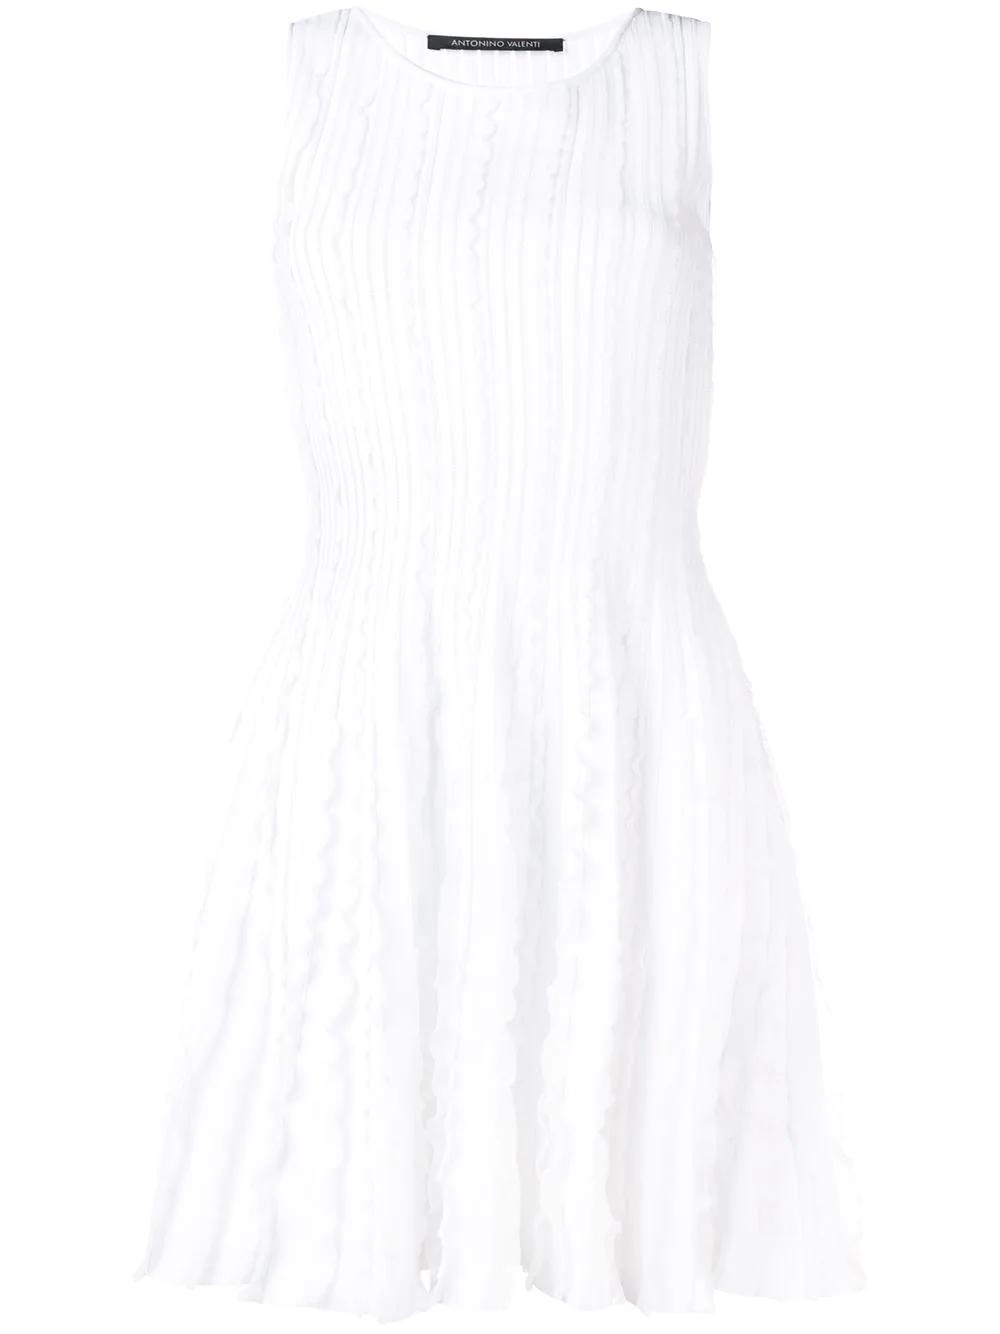 Antonino Valenti | платье миди с оборками | Clouty